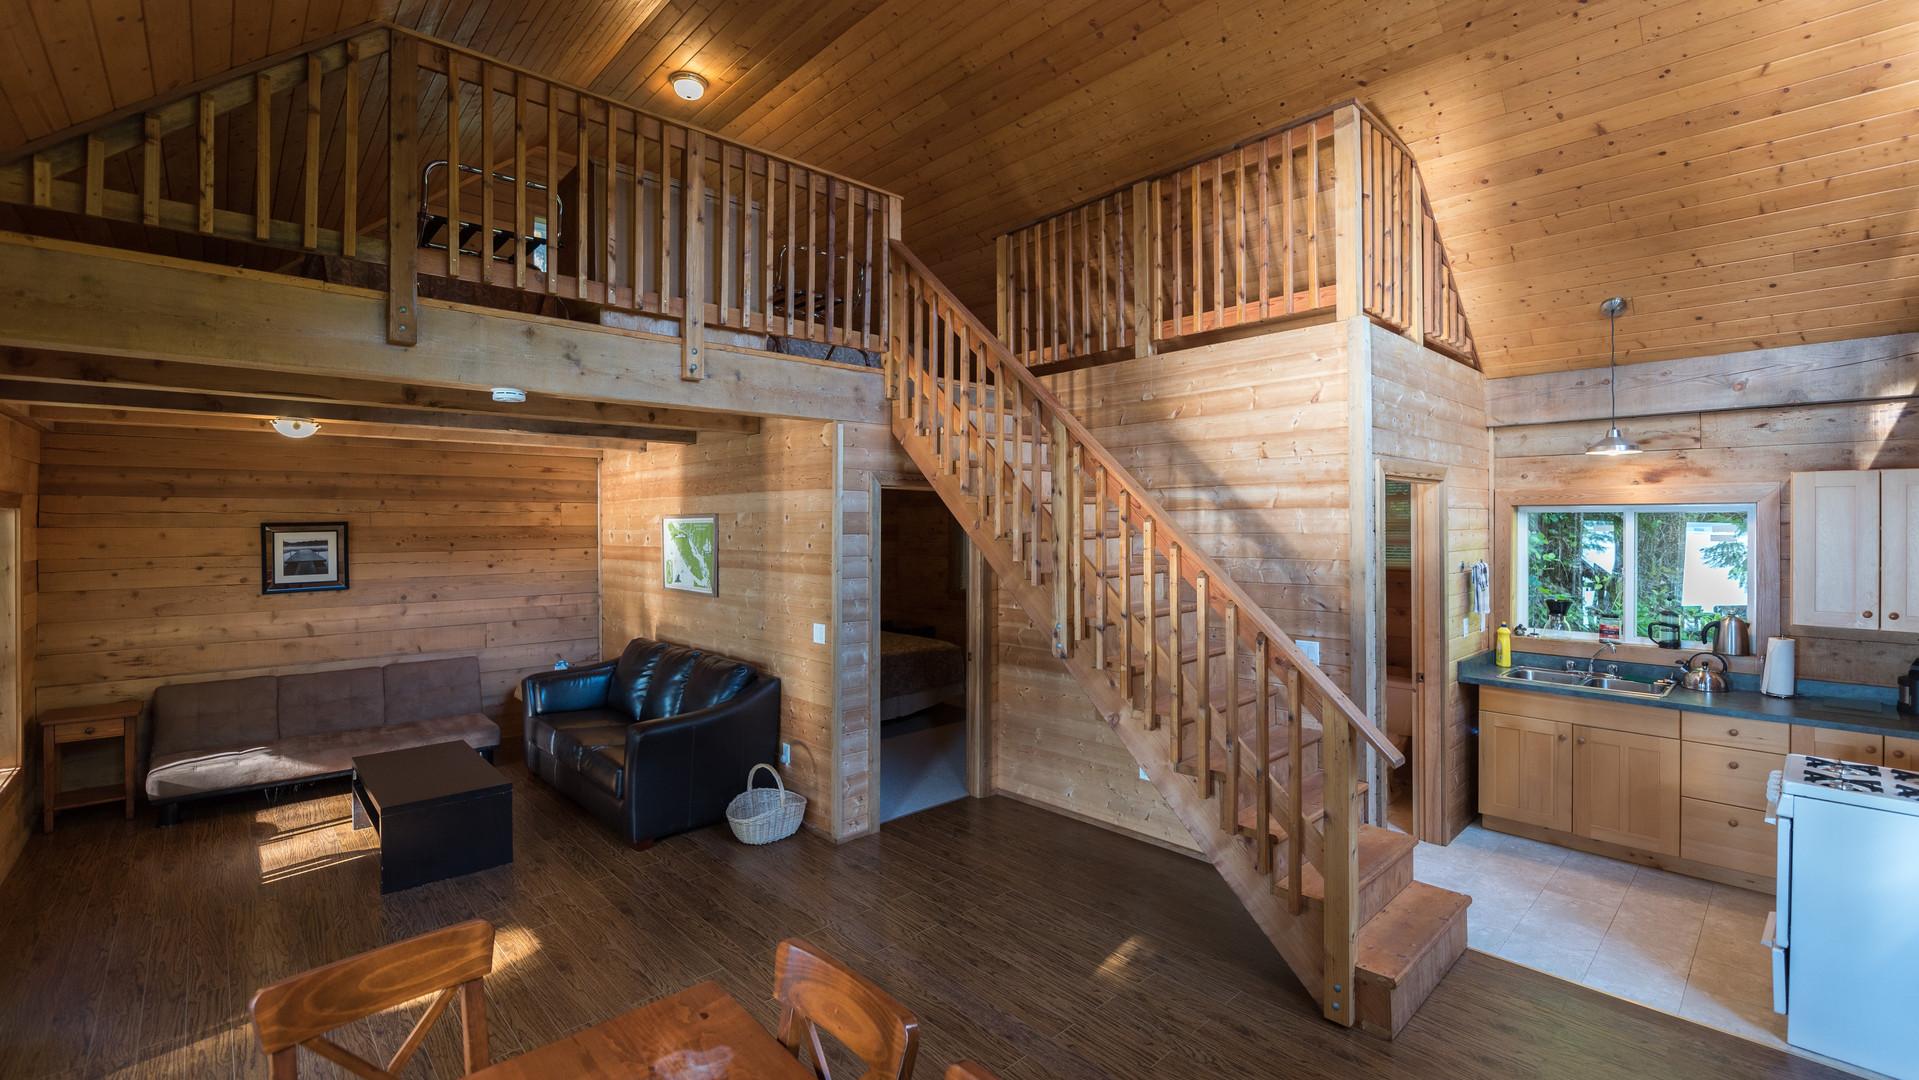 1BR Cabin